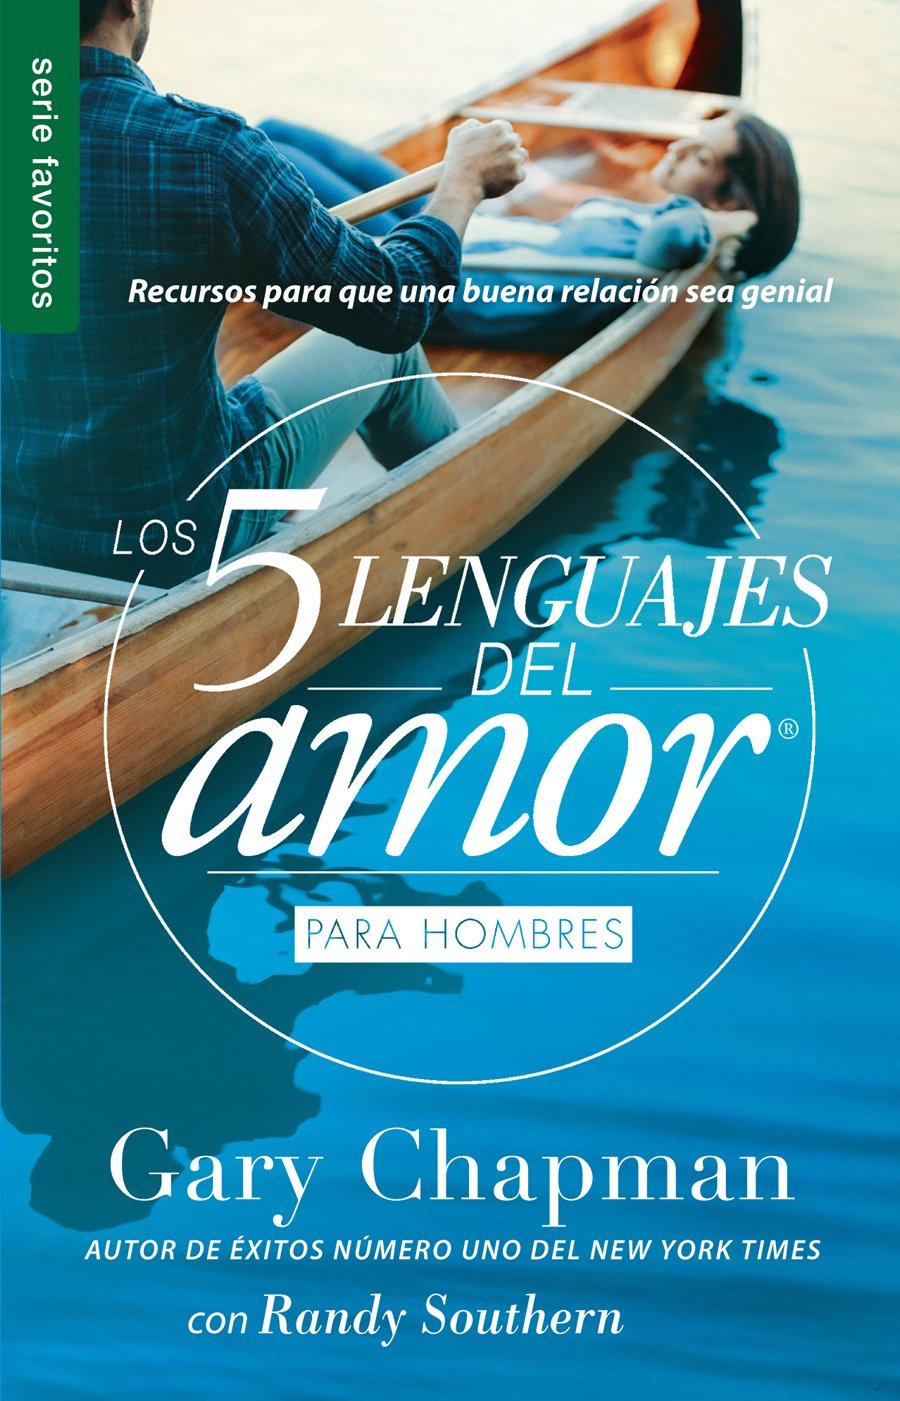 Los 5 lenguajes del amor hombres